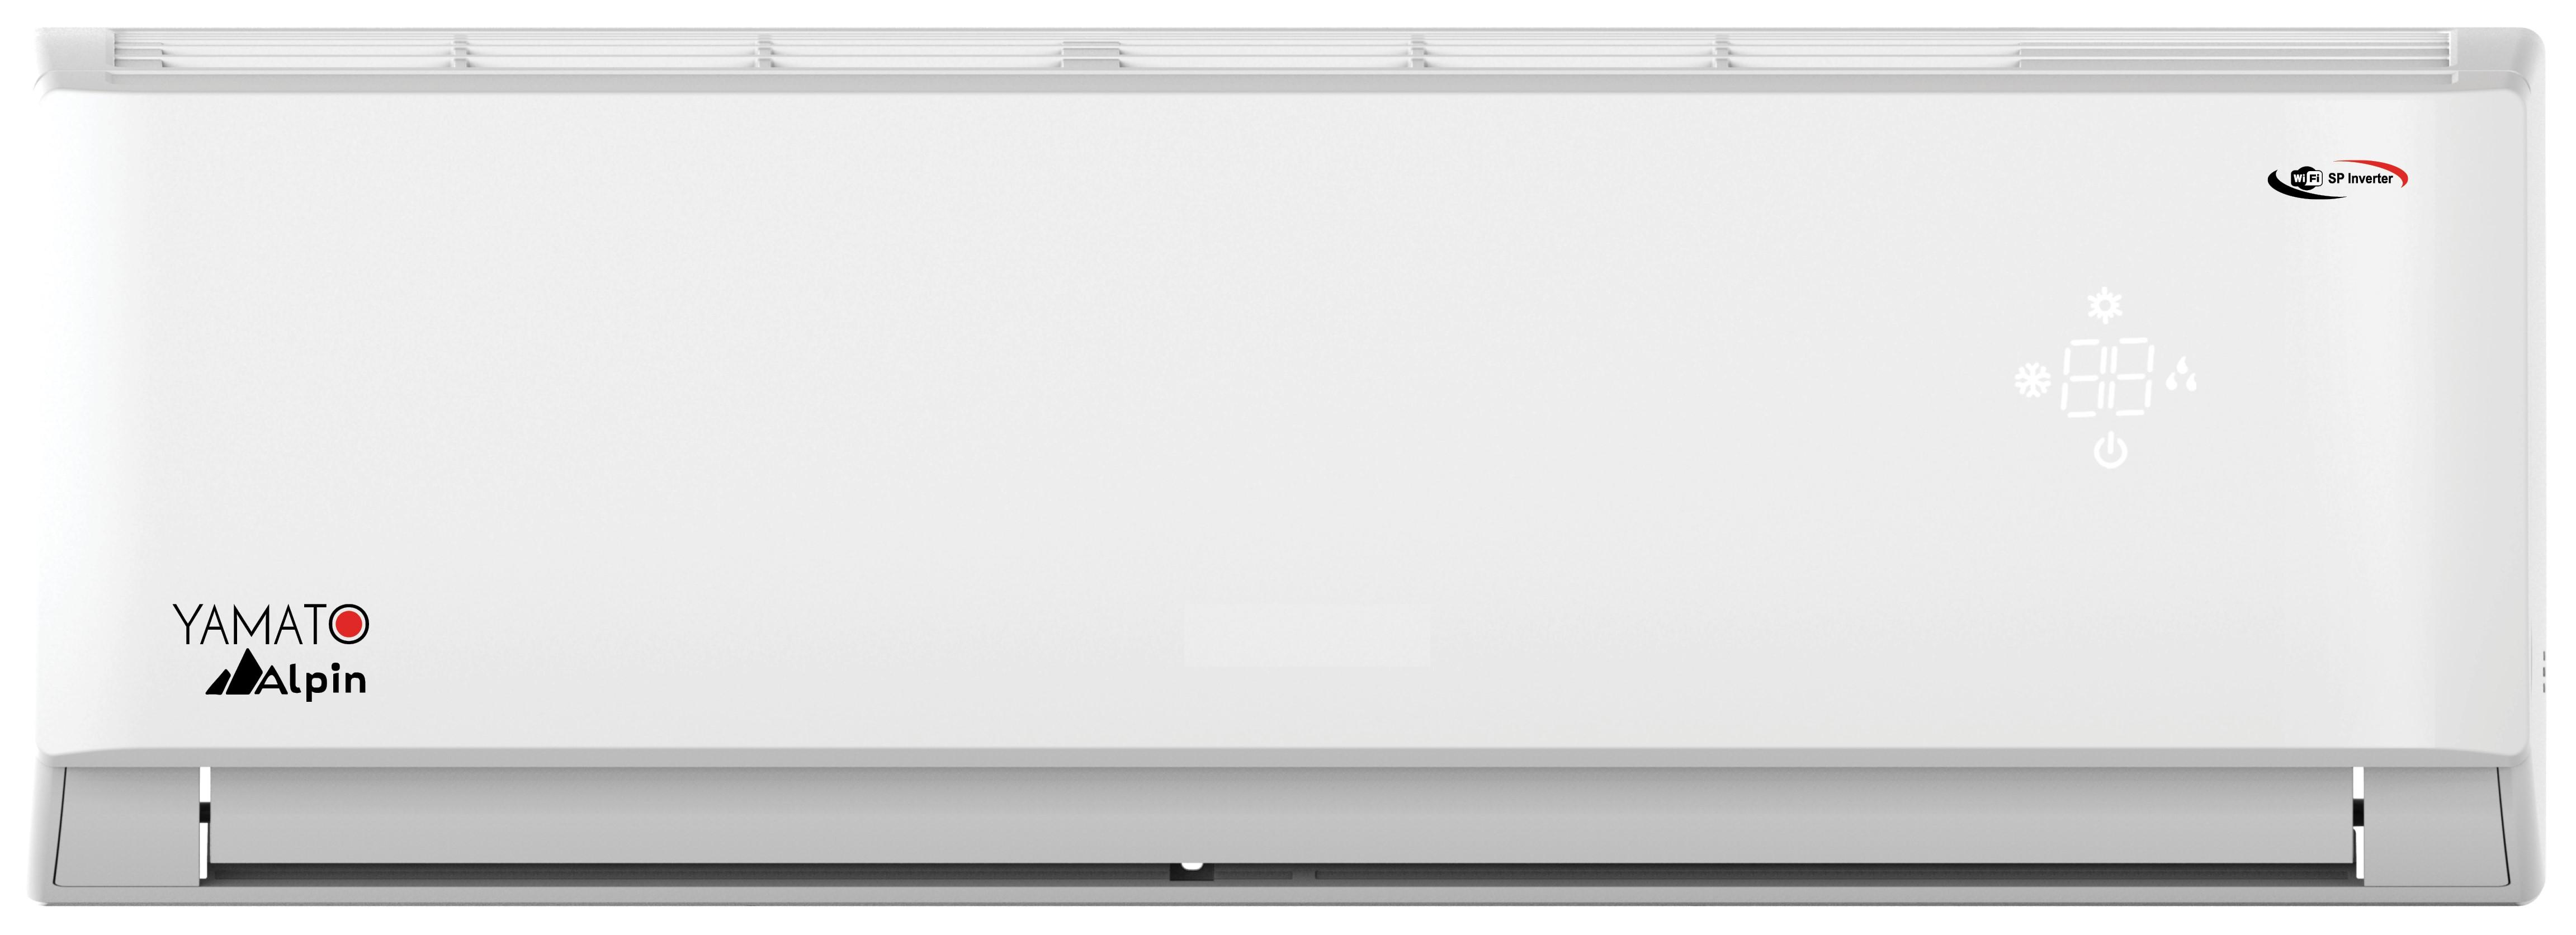 Yamato Alpin Aer conditionat YW12IG5, 12000 BTU, Kit de instalare, Wi-Fi, Alb